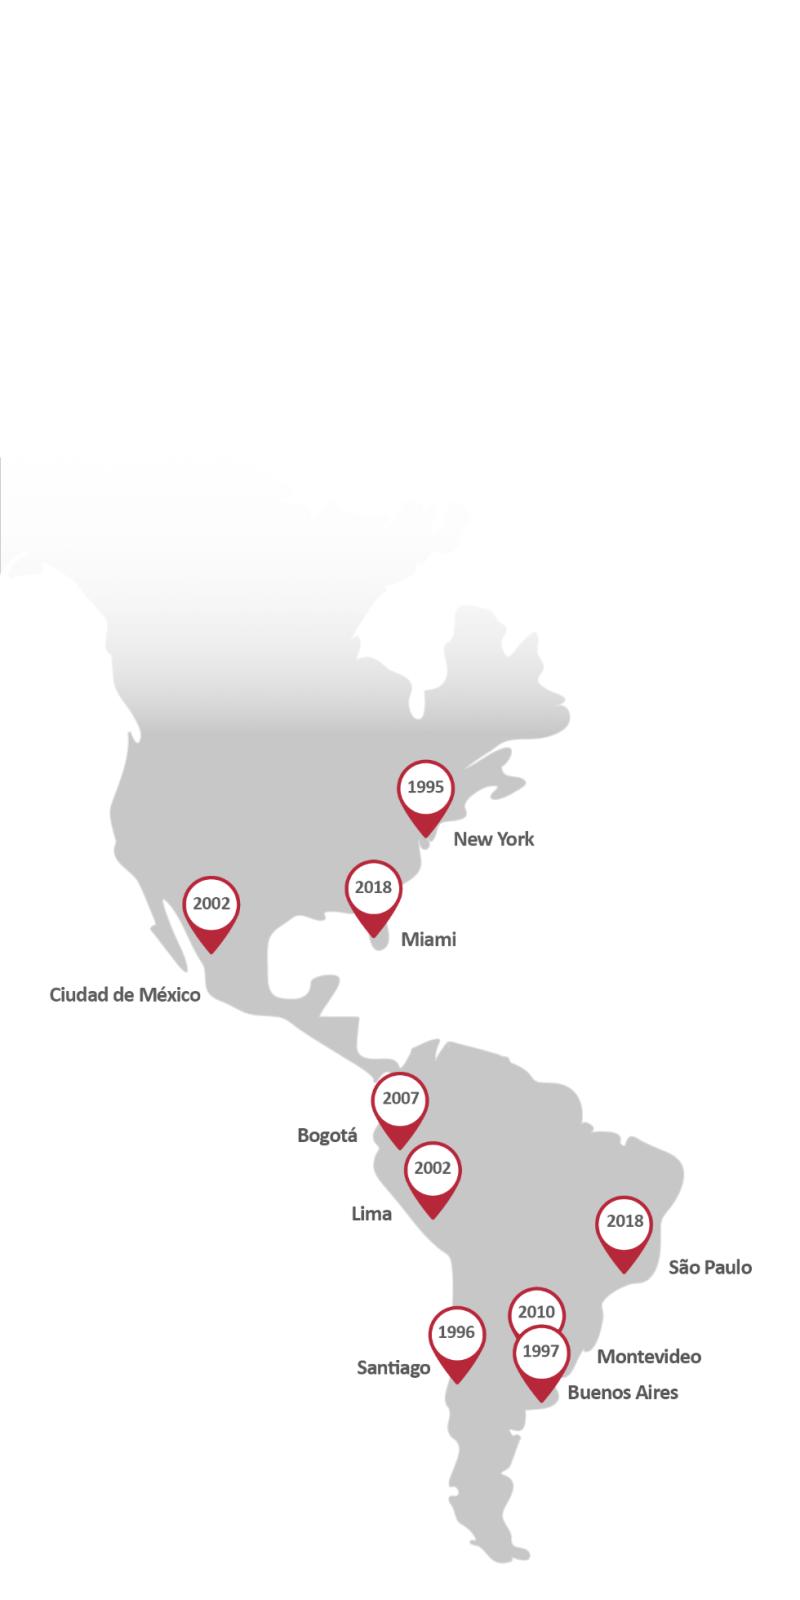 mapa de presencia de compass group y pagoaltoque en América